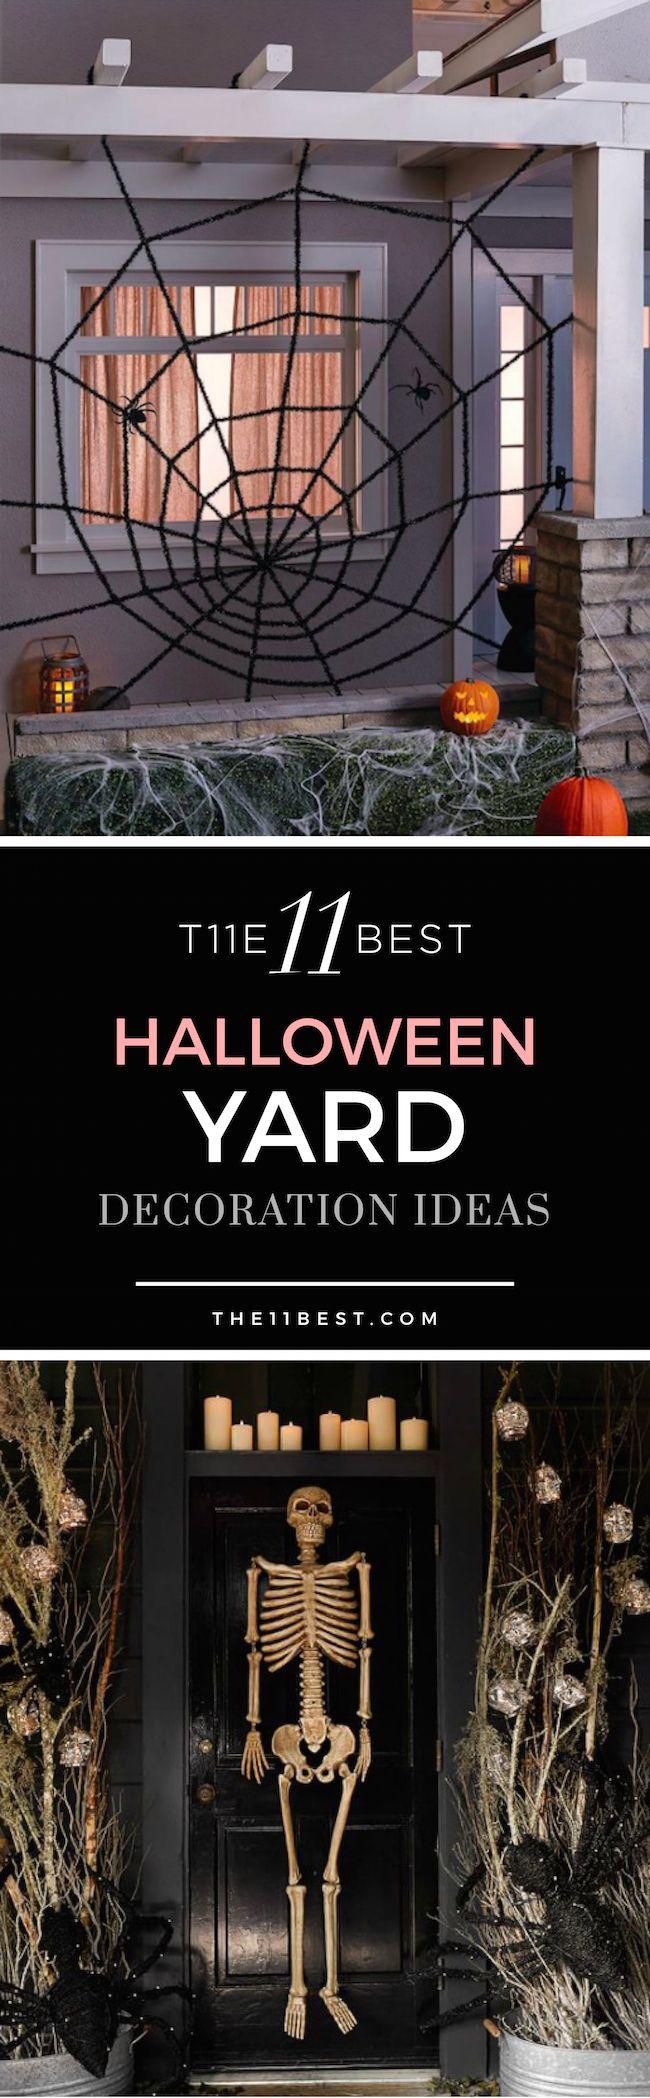 The 11 Best Halloween Yard Decoration ideas